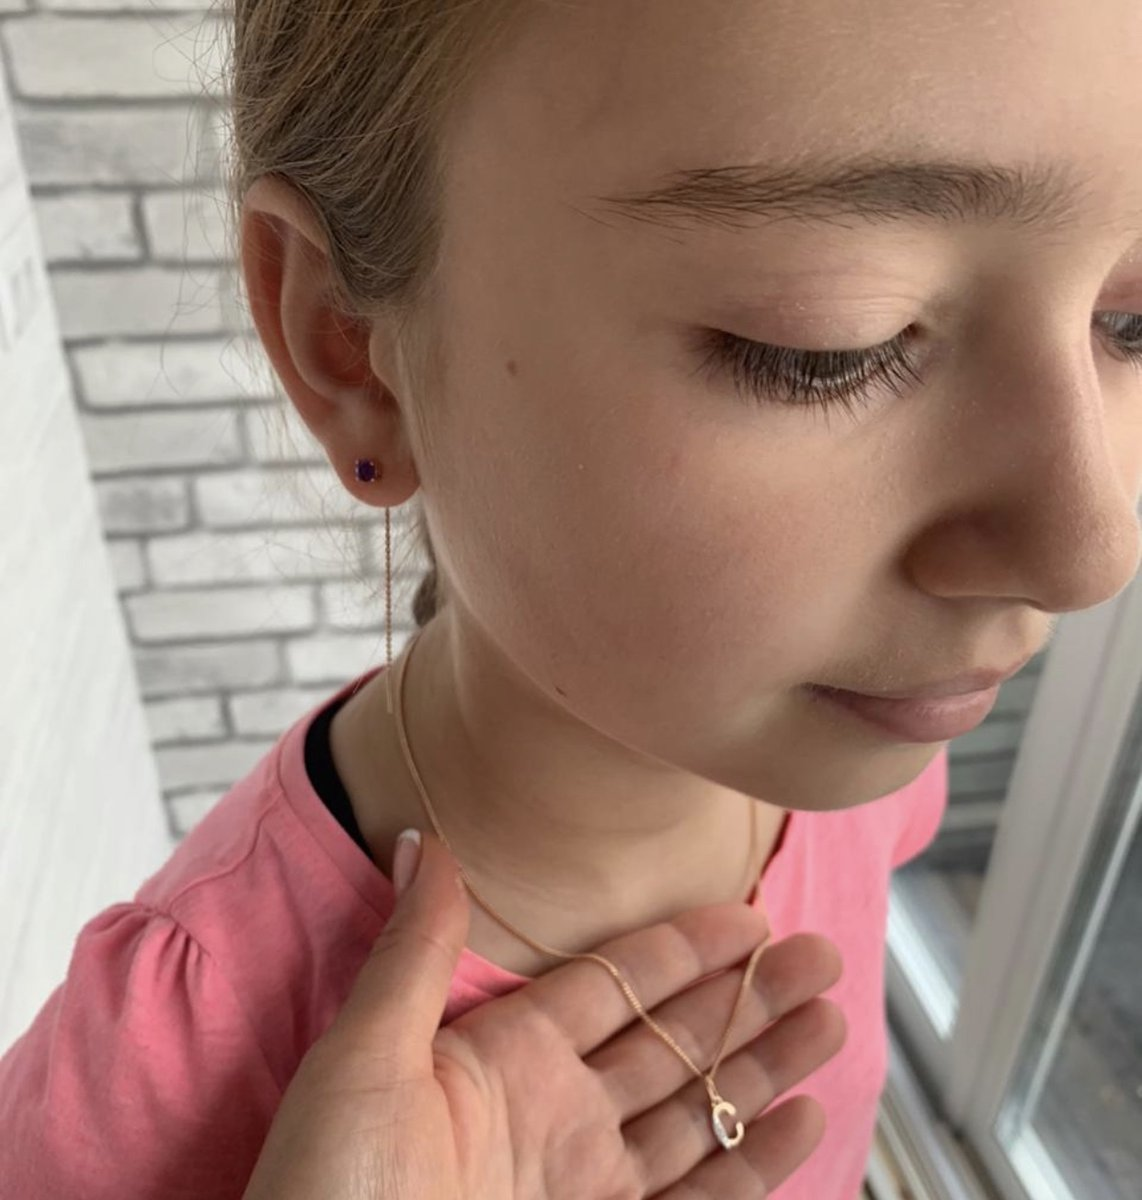 Сережки на 10 лет девочке